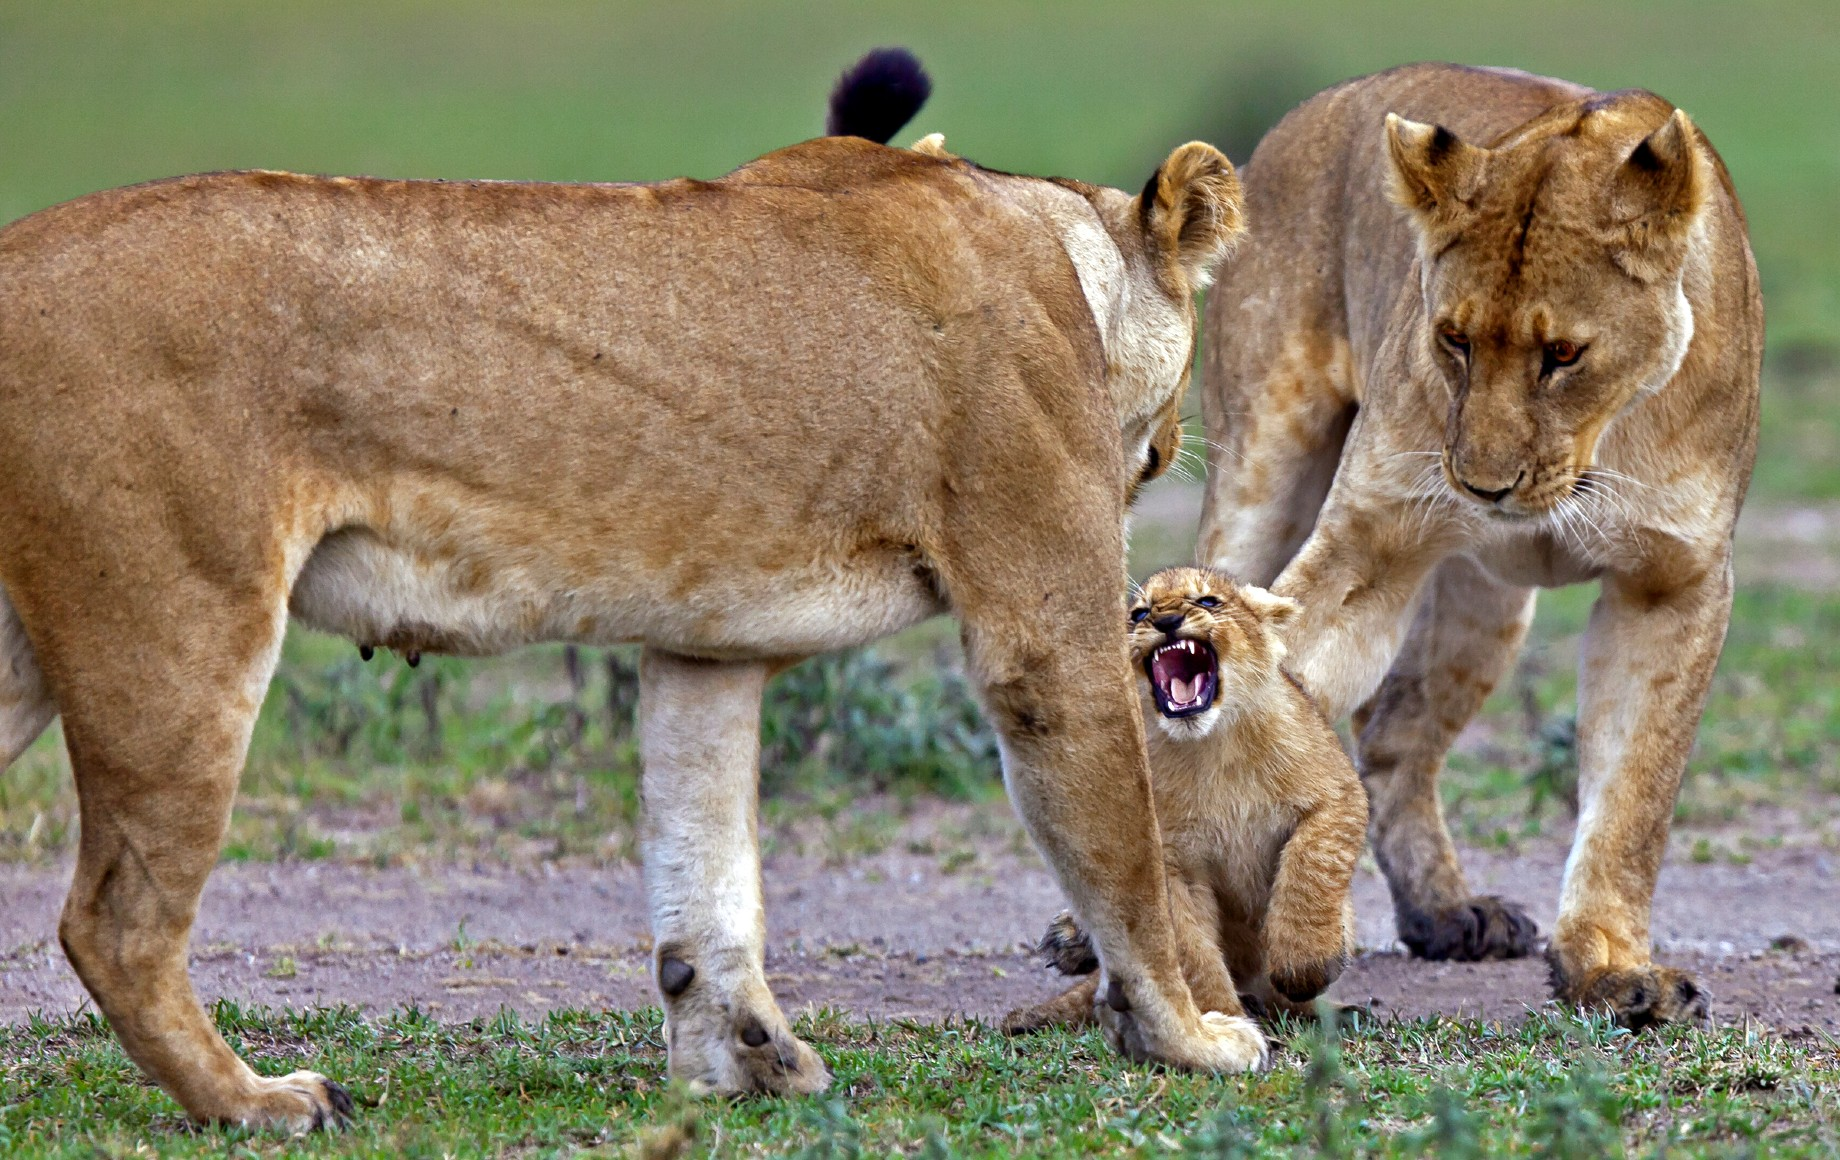 a cub roaring at a female lion